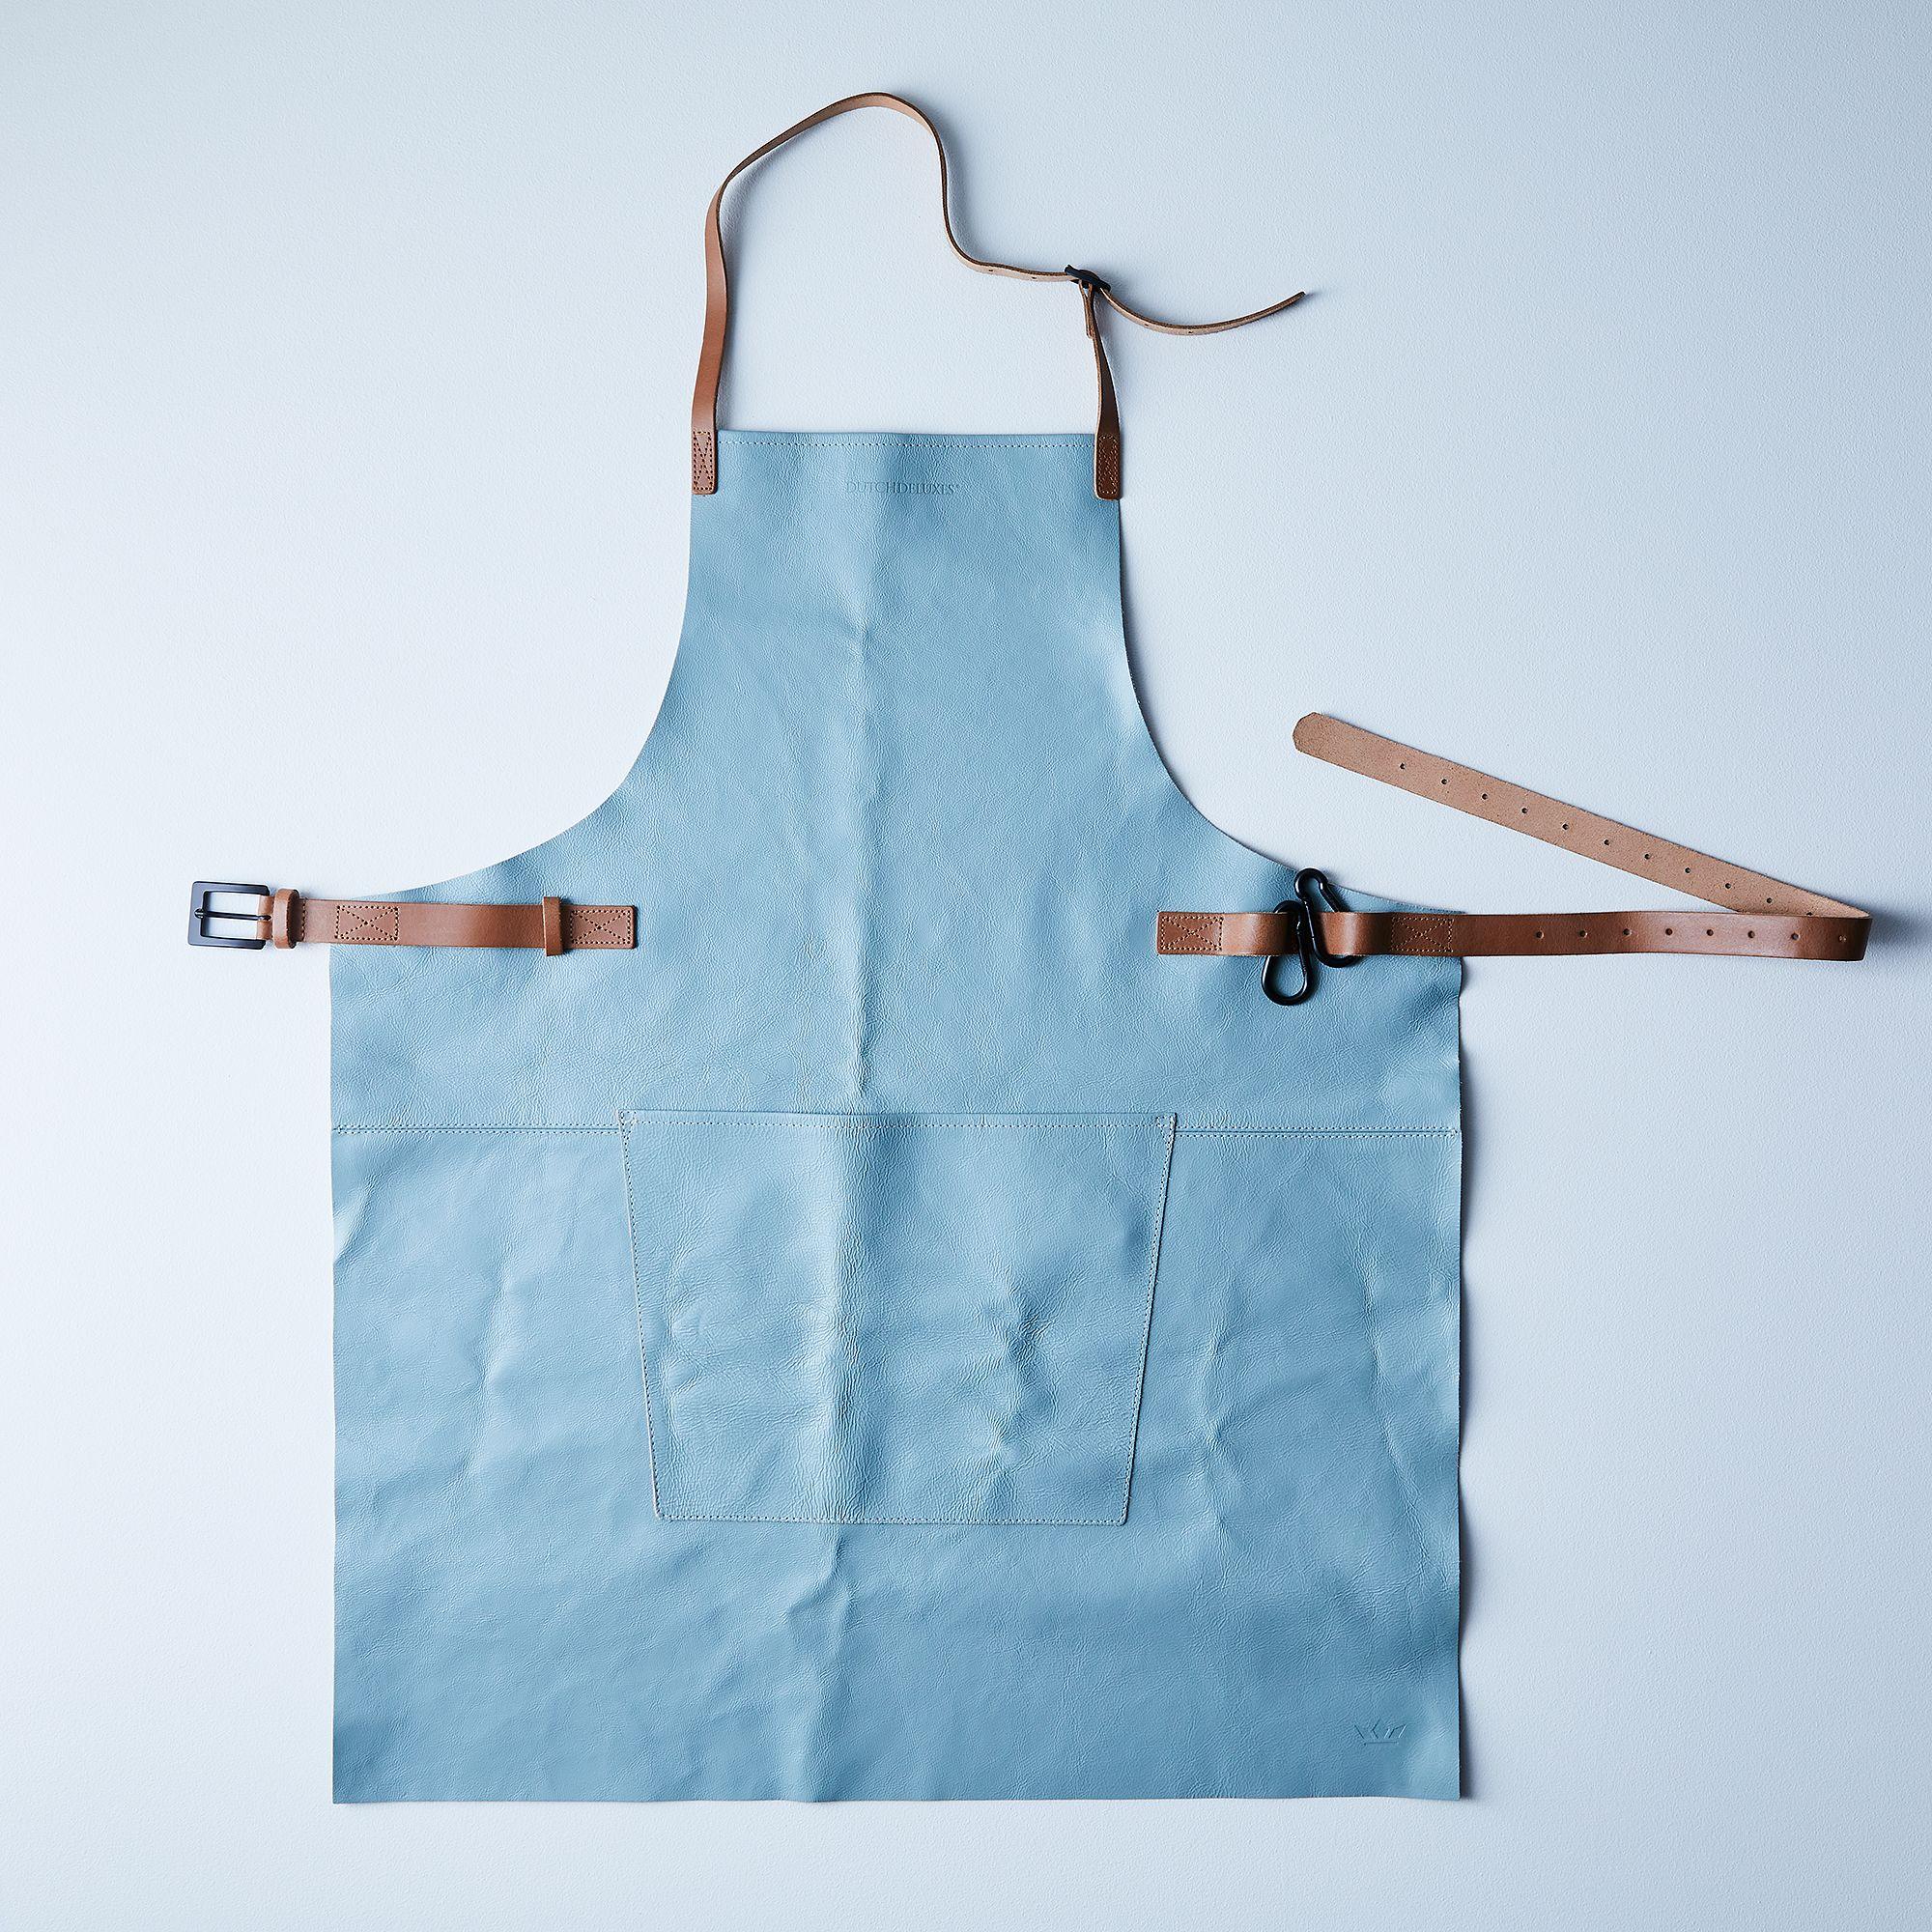 F3071837 0c3d 4d13 9b77 2c0f689aa962  2017 1120 dutchdeluxes dutch leather apron dusty blue silo ty mecham 008